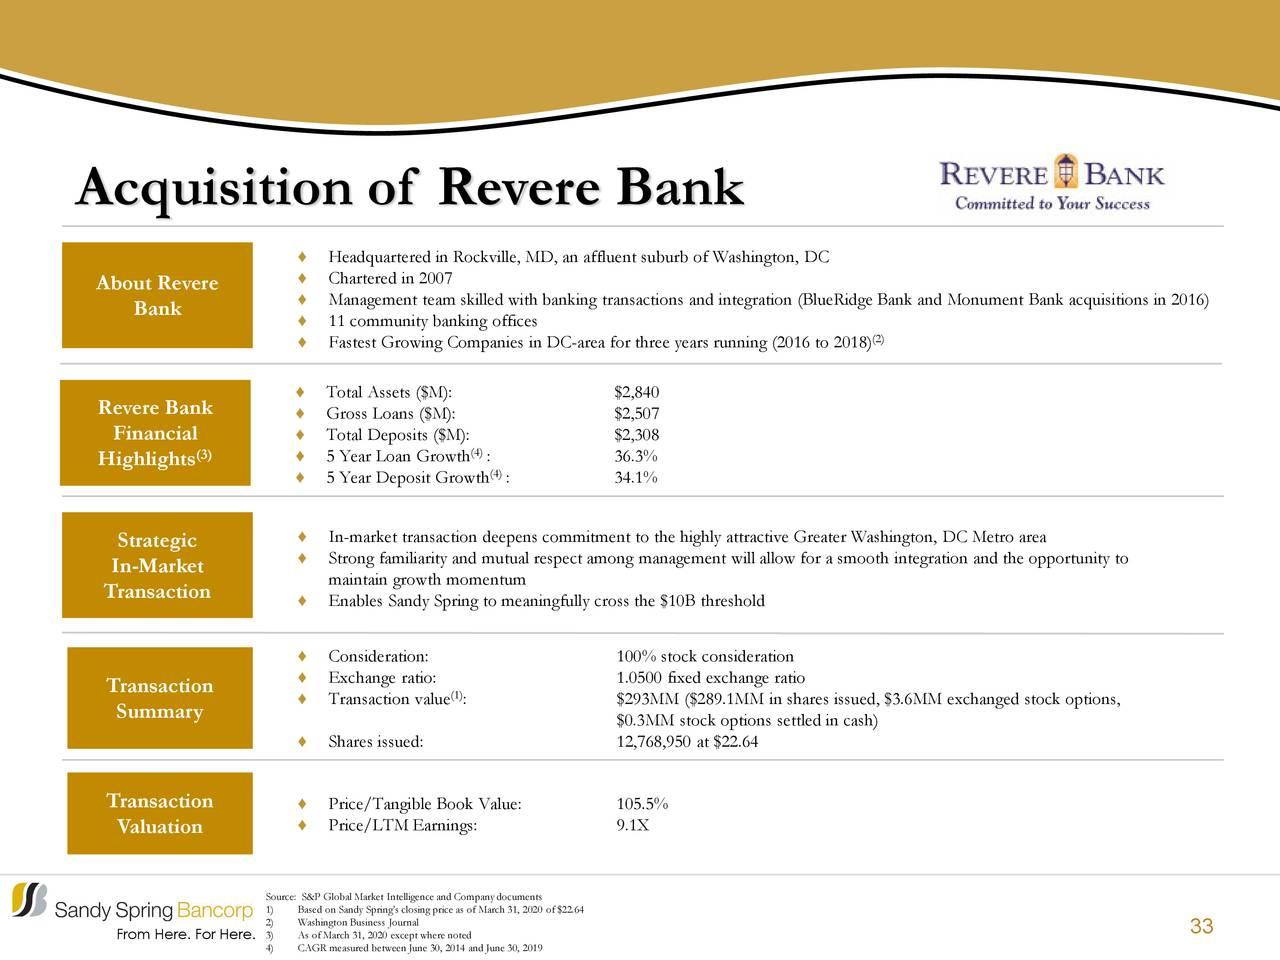 Adquisición de Revere Bank